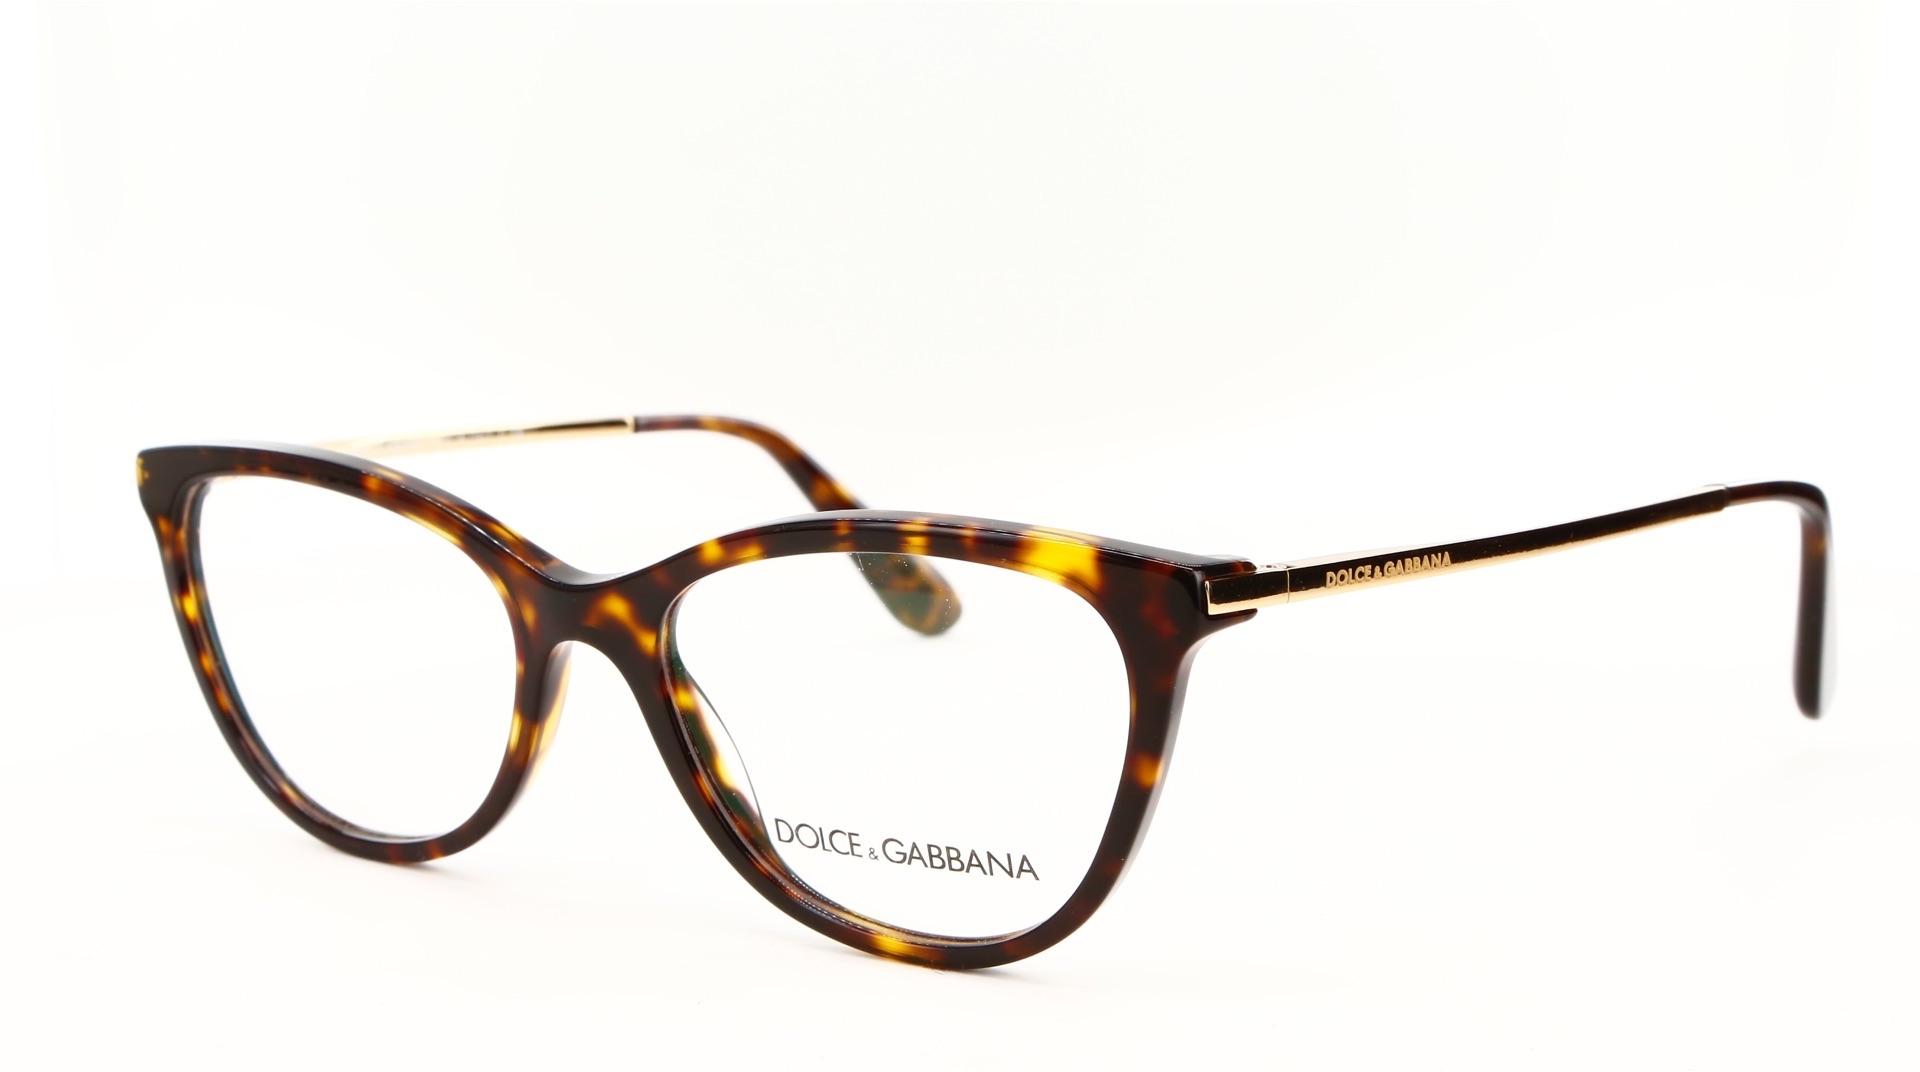 Dolce & Gabbana - ref: 78613